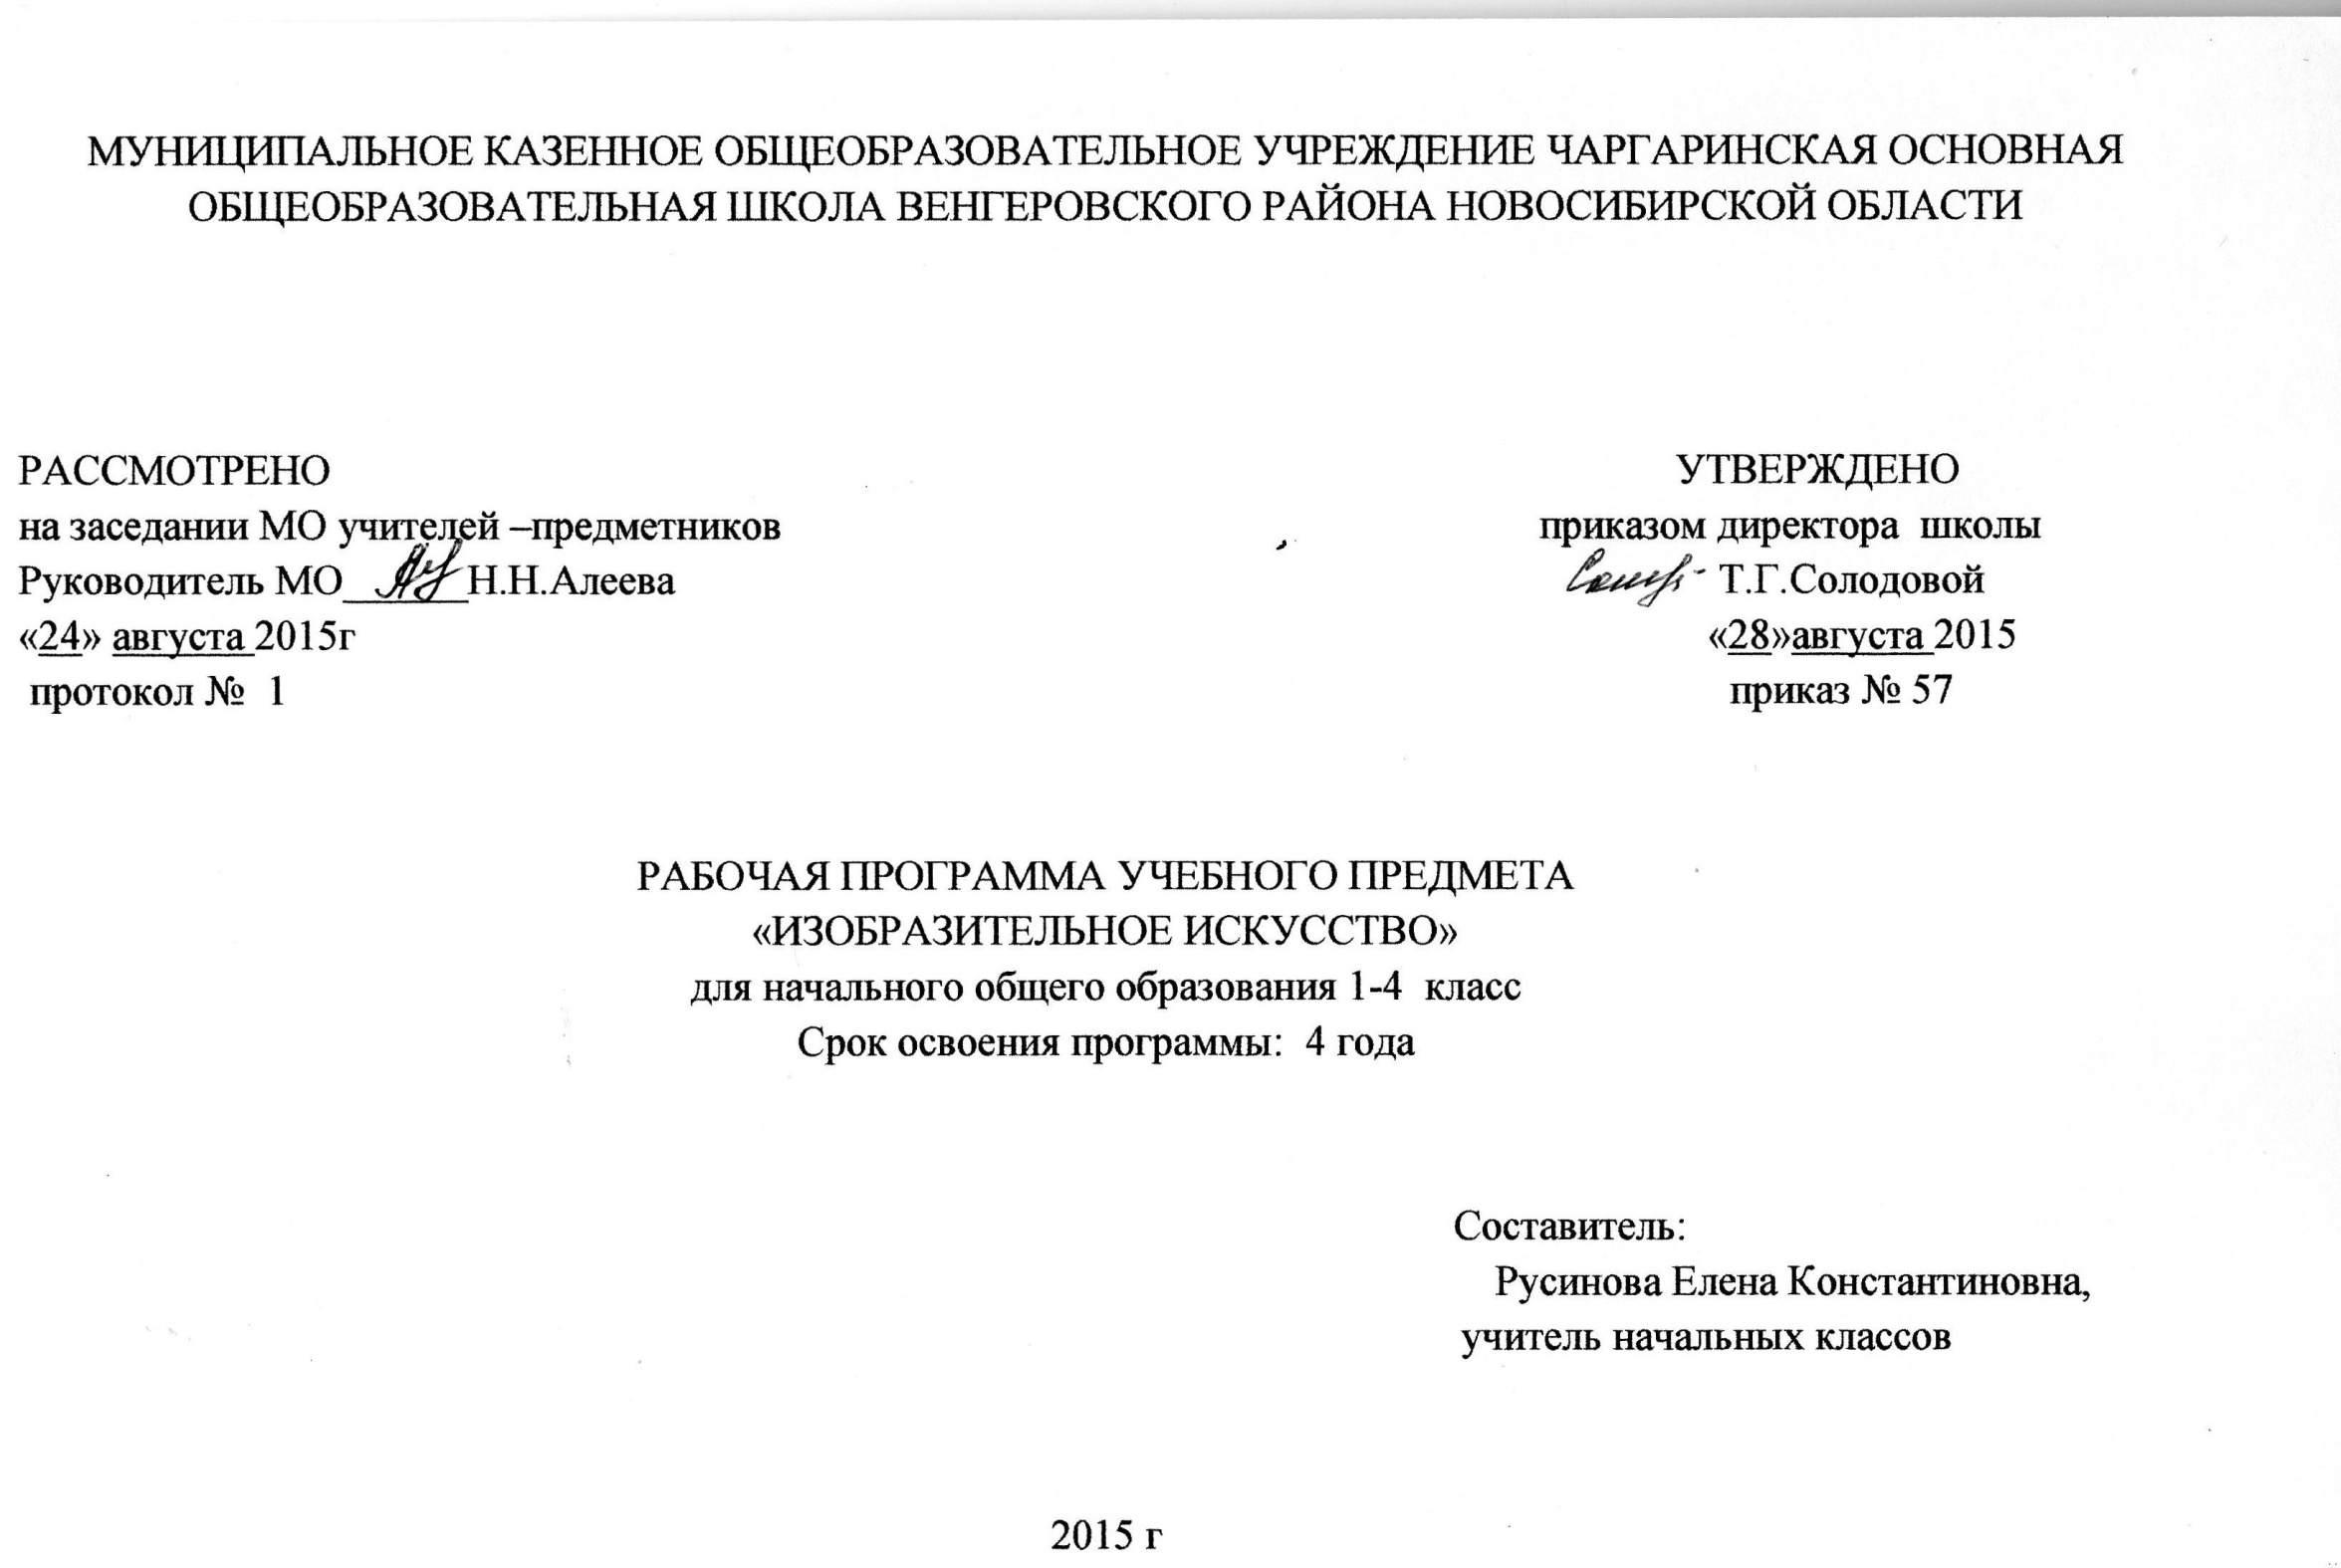 C:\Documents and Settings\Admin\Рабочий стол\img192.jpg